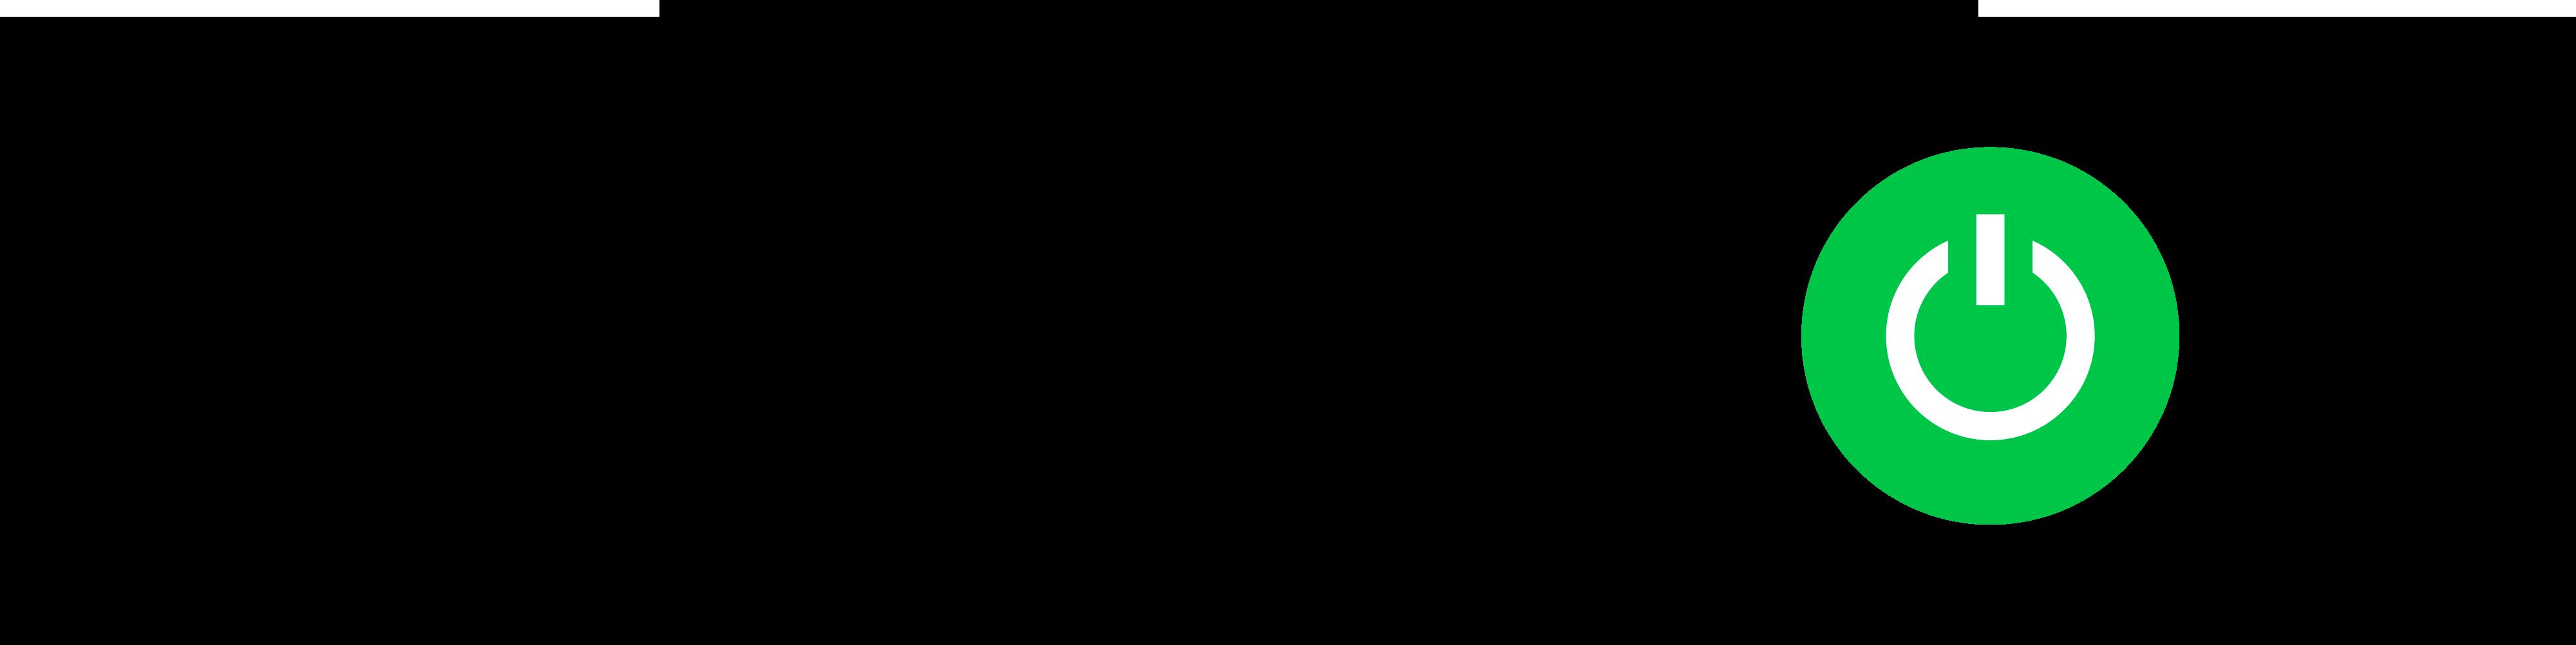 $u1692jm437b